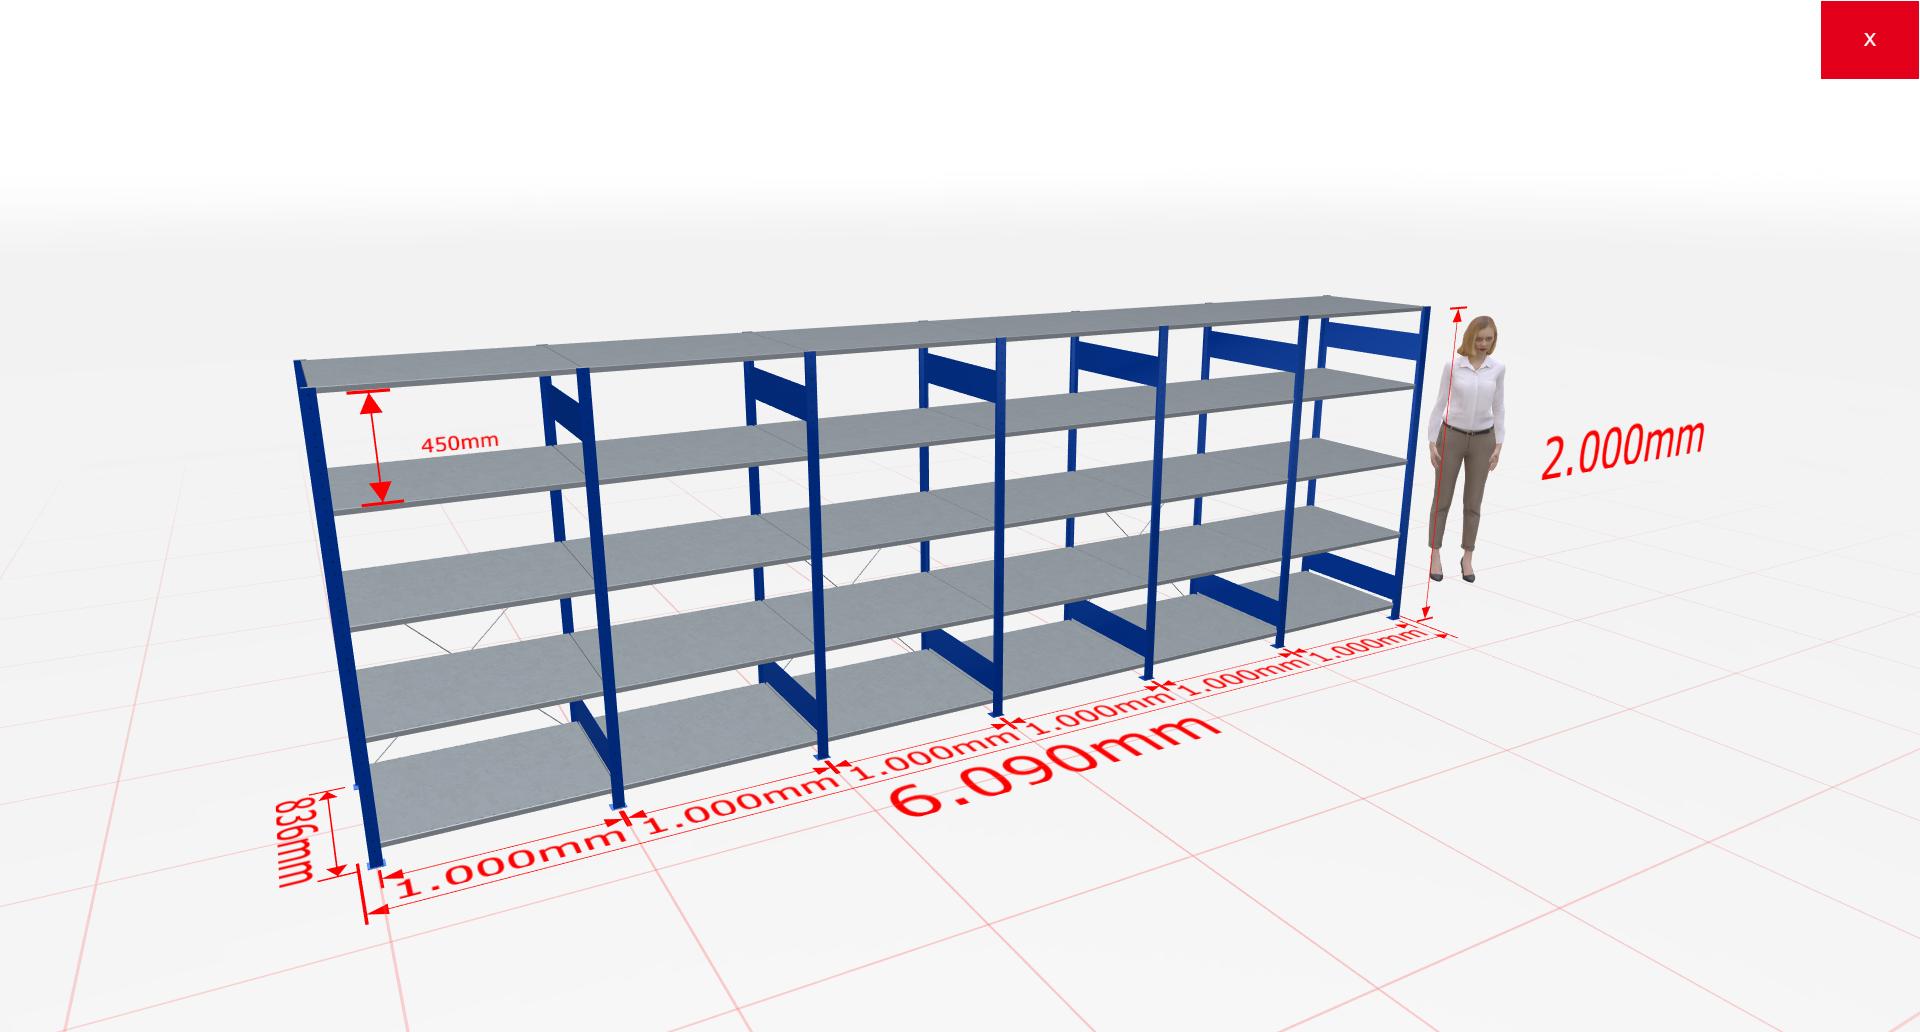 Fachbodenregal Komplettregal 2000x6090x800 mm (HxBxT) SCHULTE Lagertechnik blau 5 Ebenen  150 kg je Boden